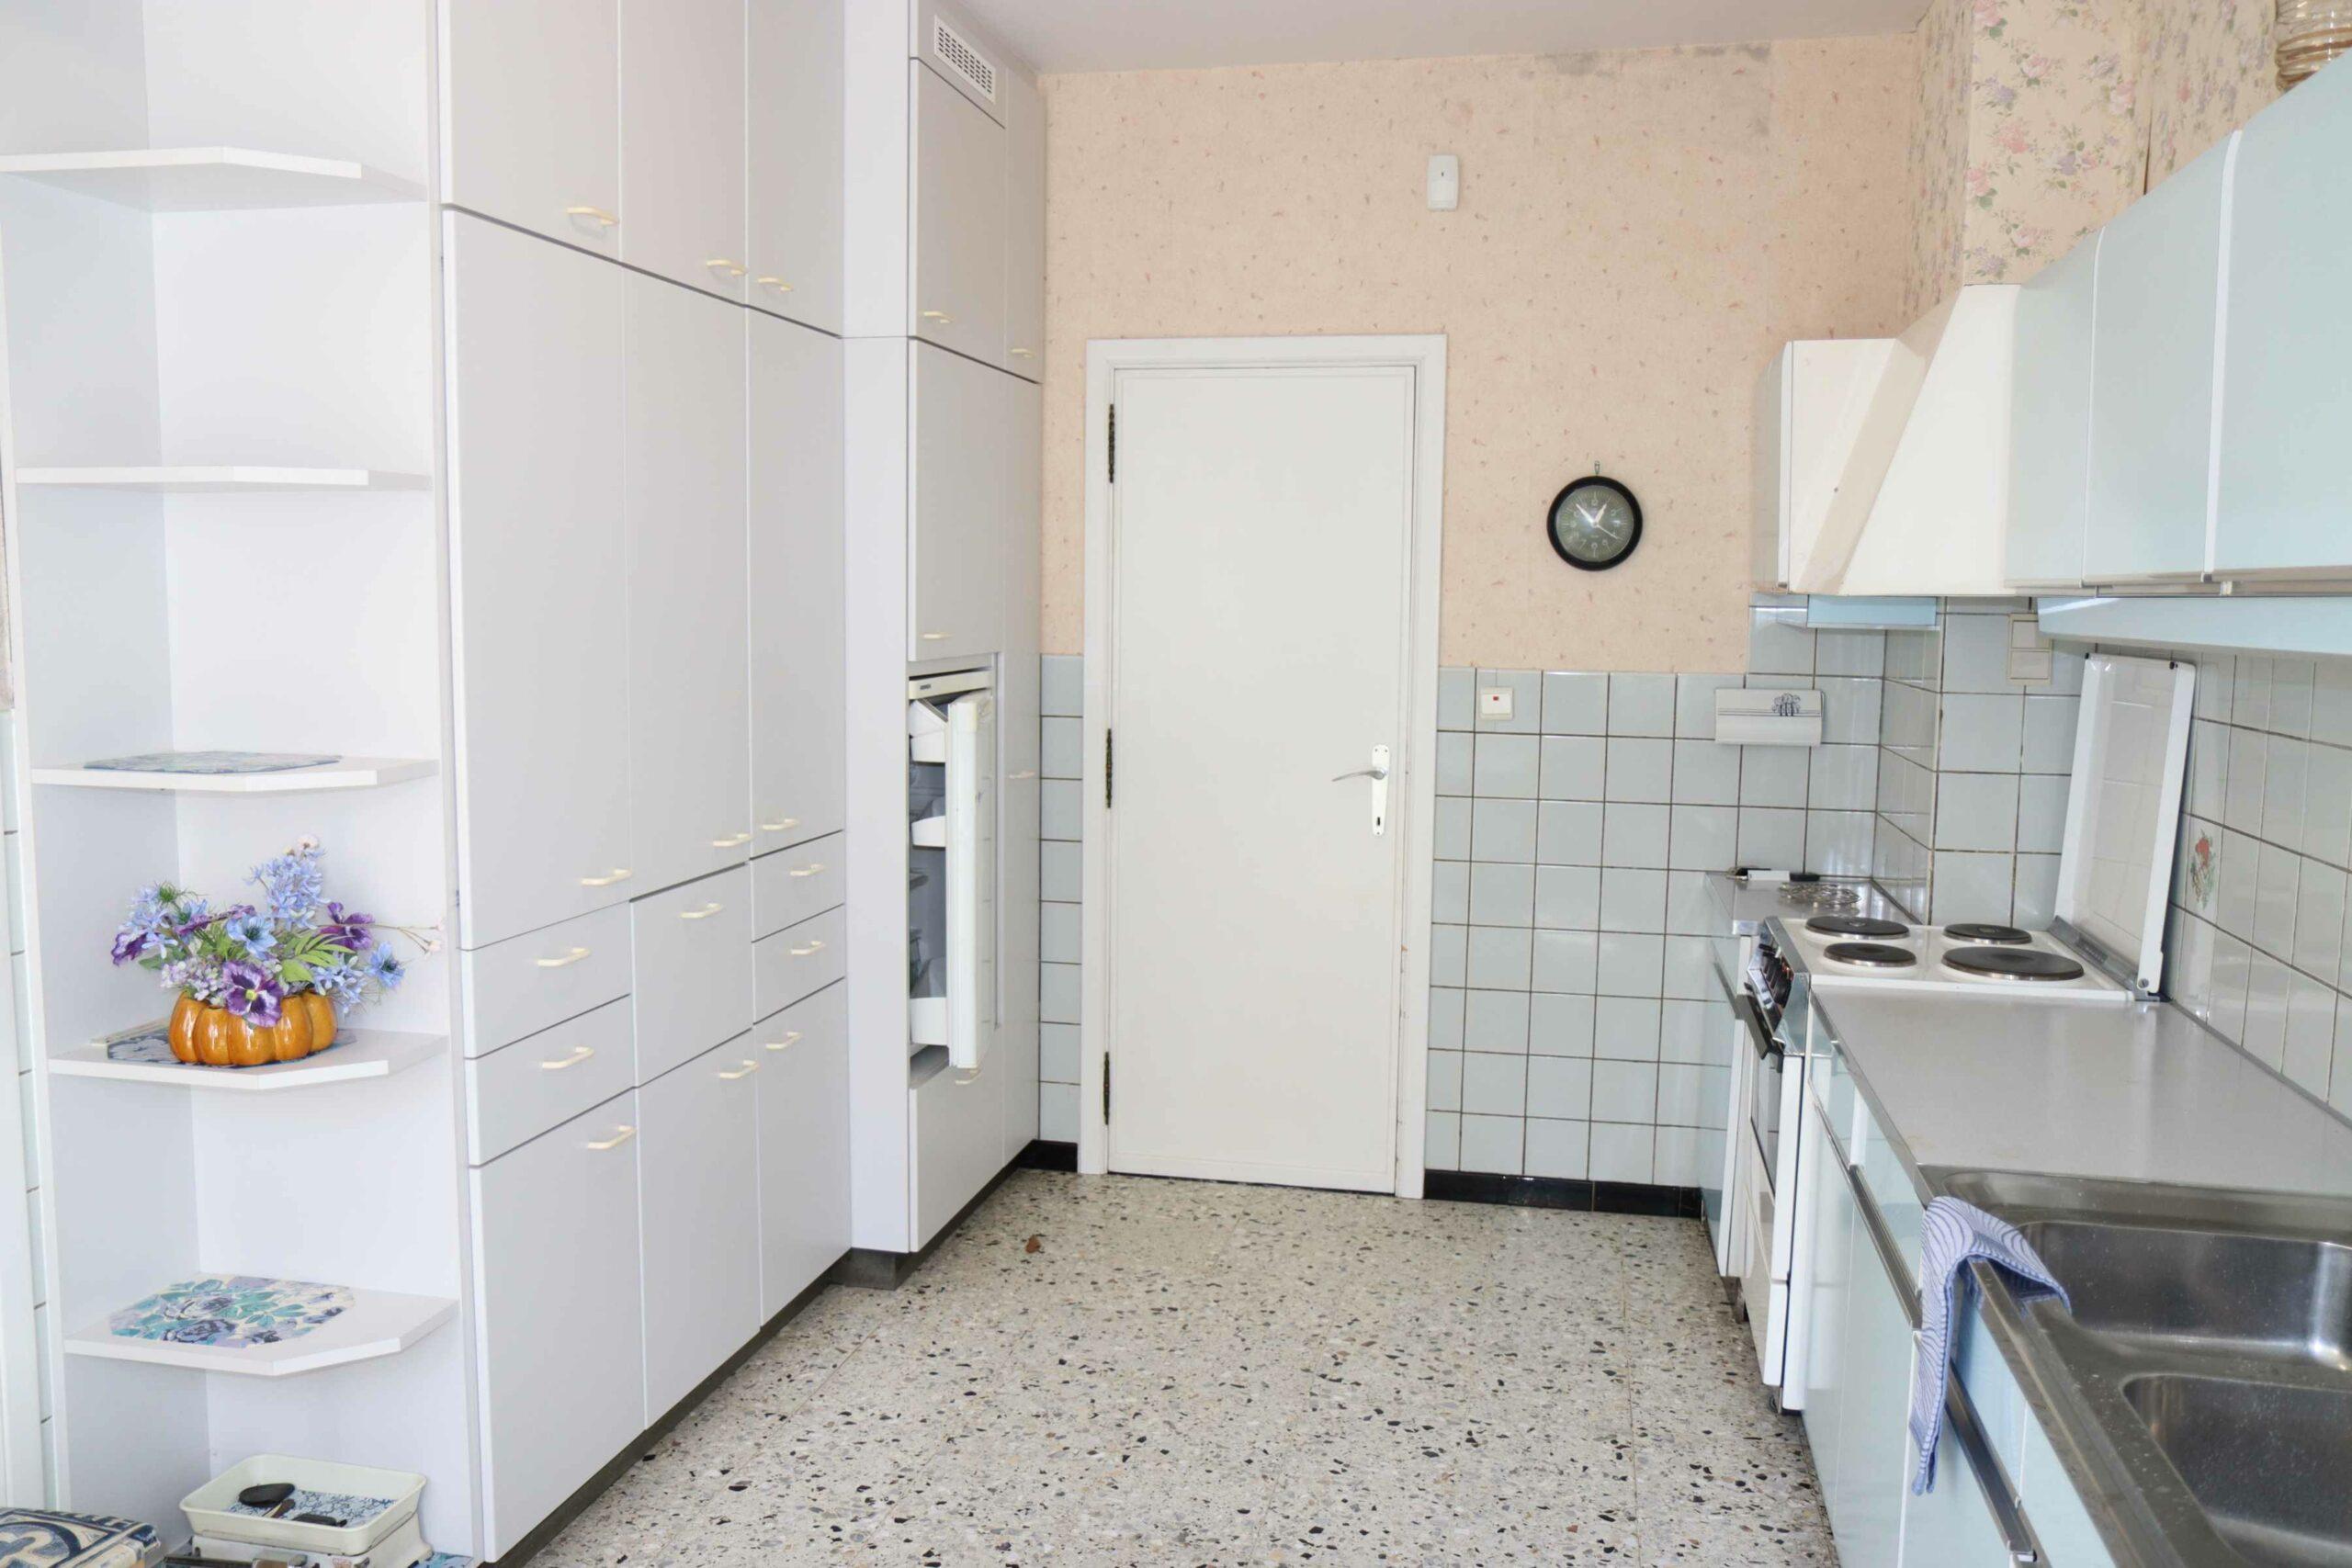 2 keuken 2